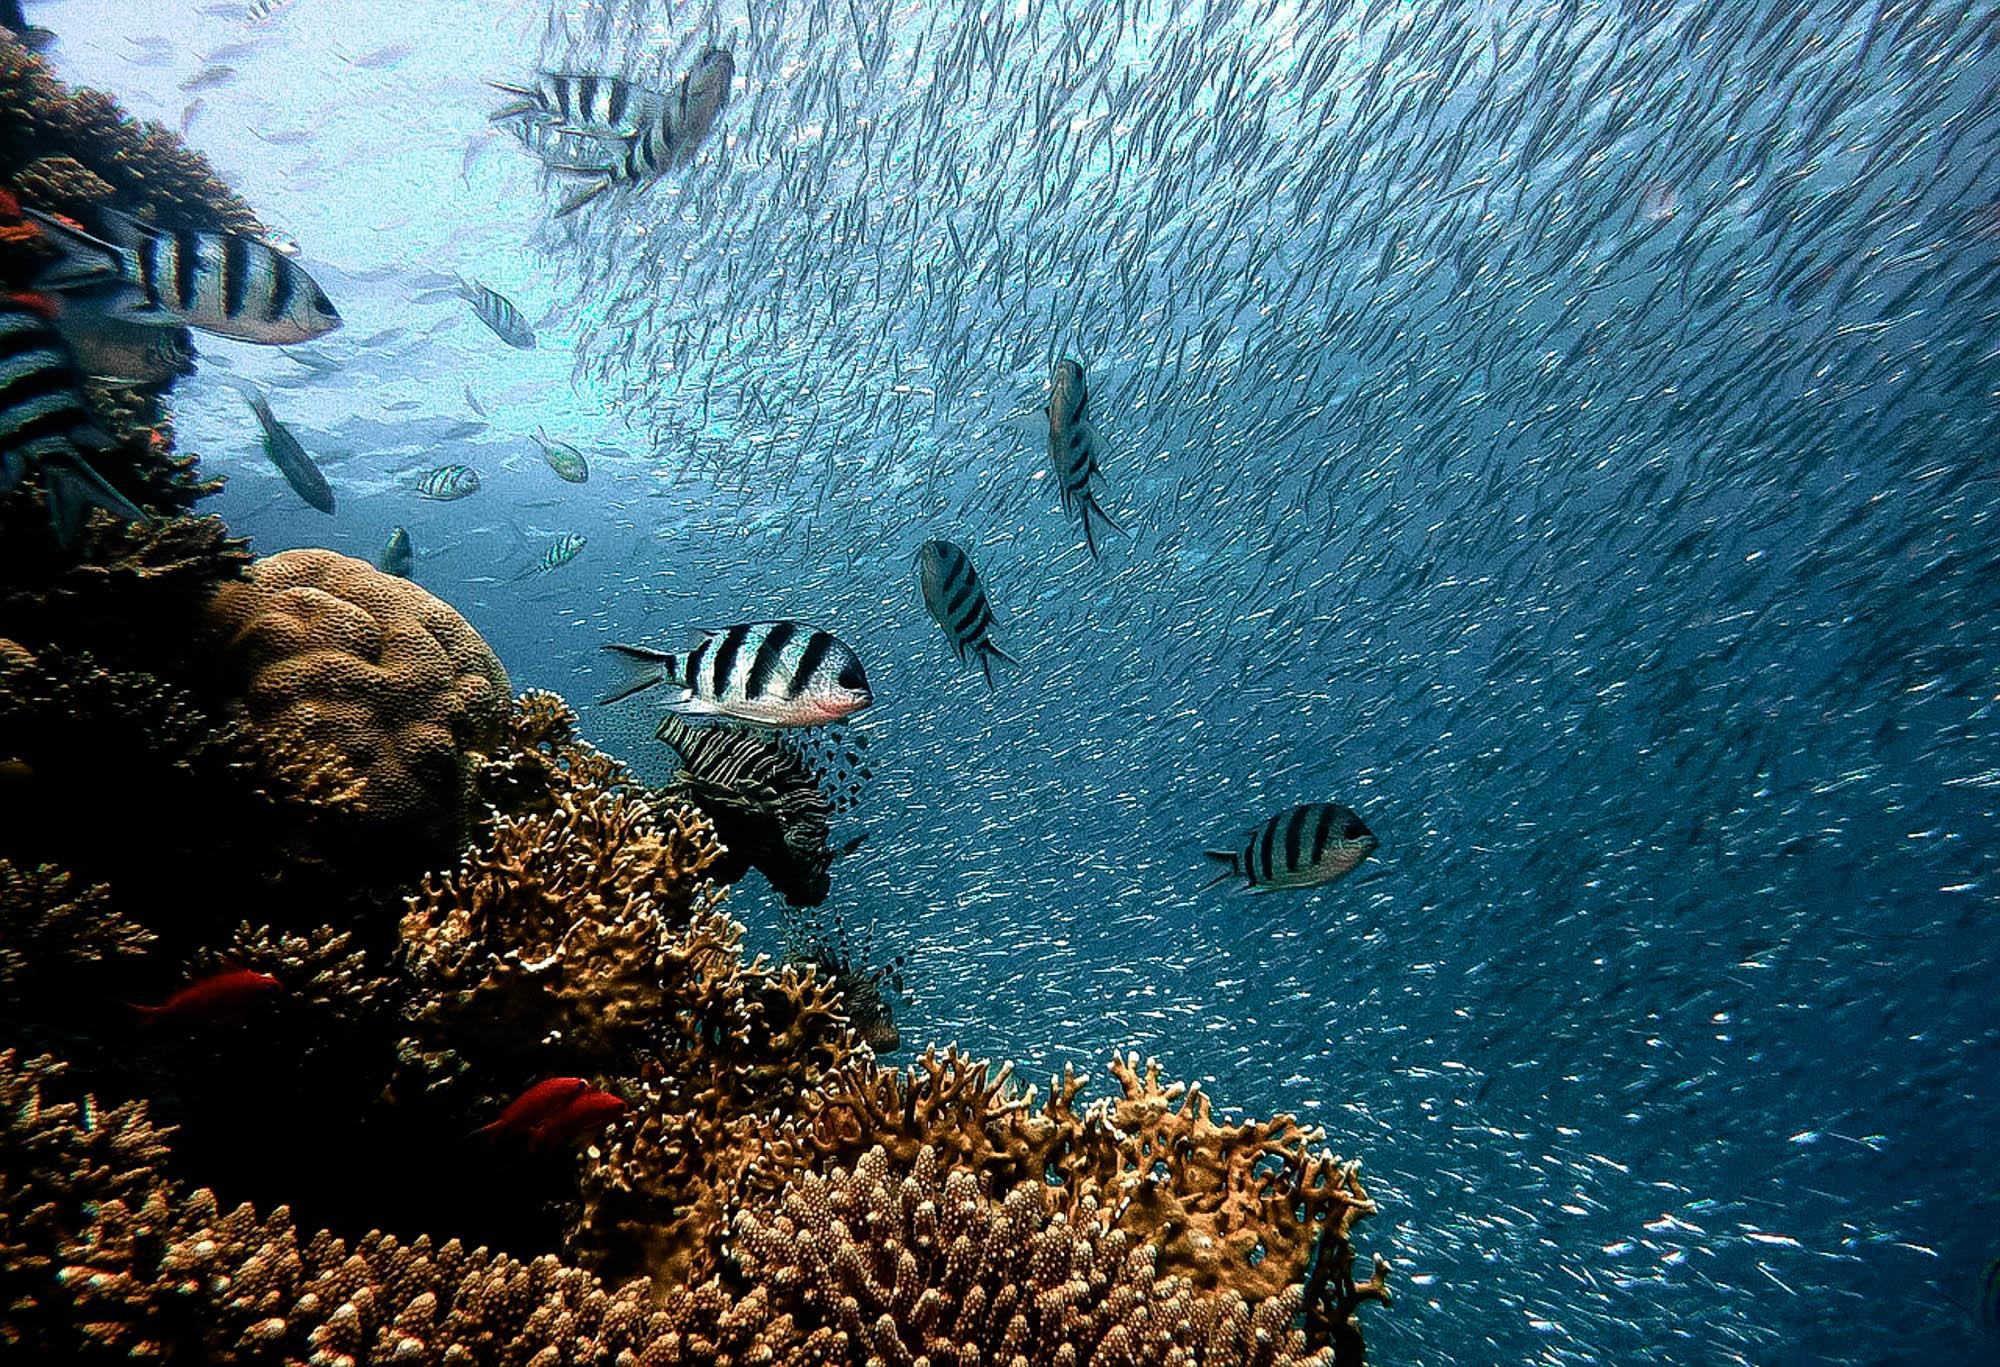 sardine-run-3-1-of-1